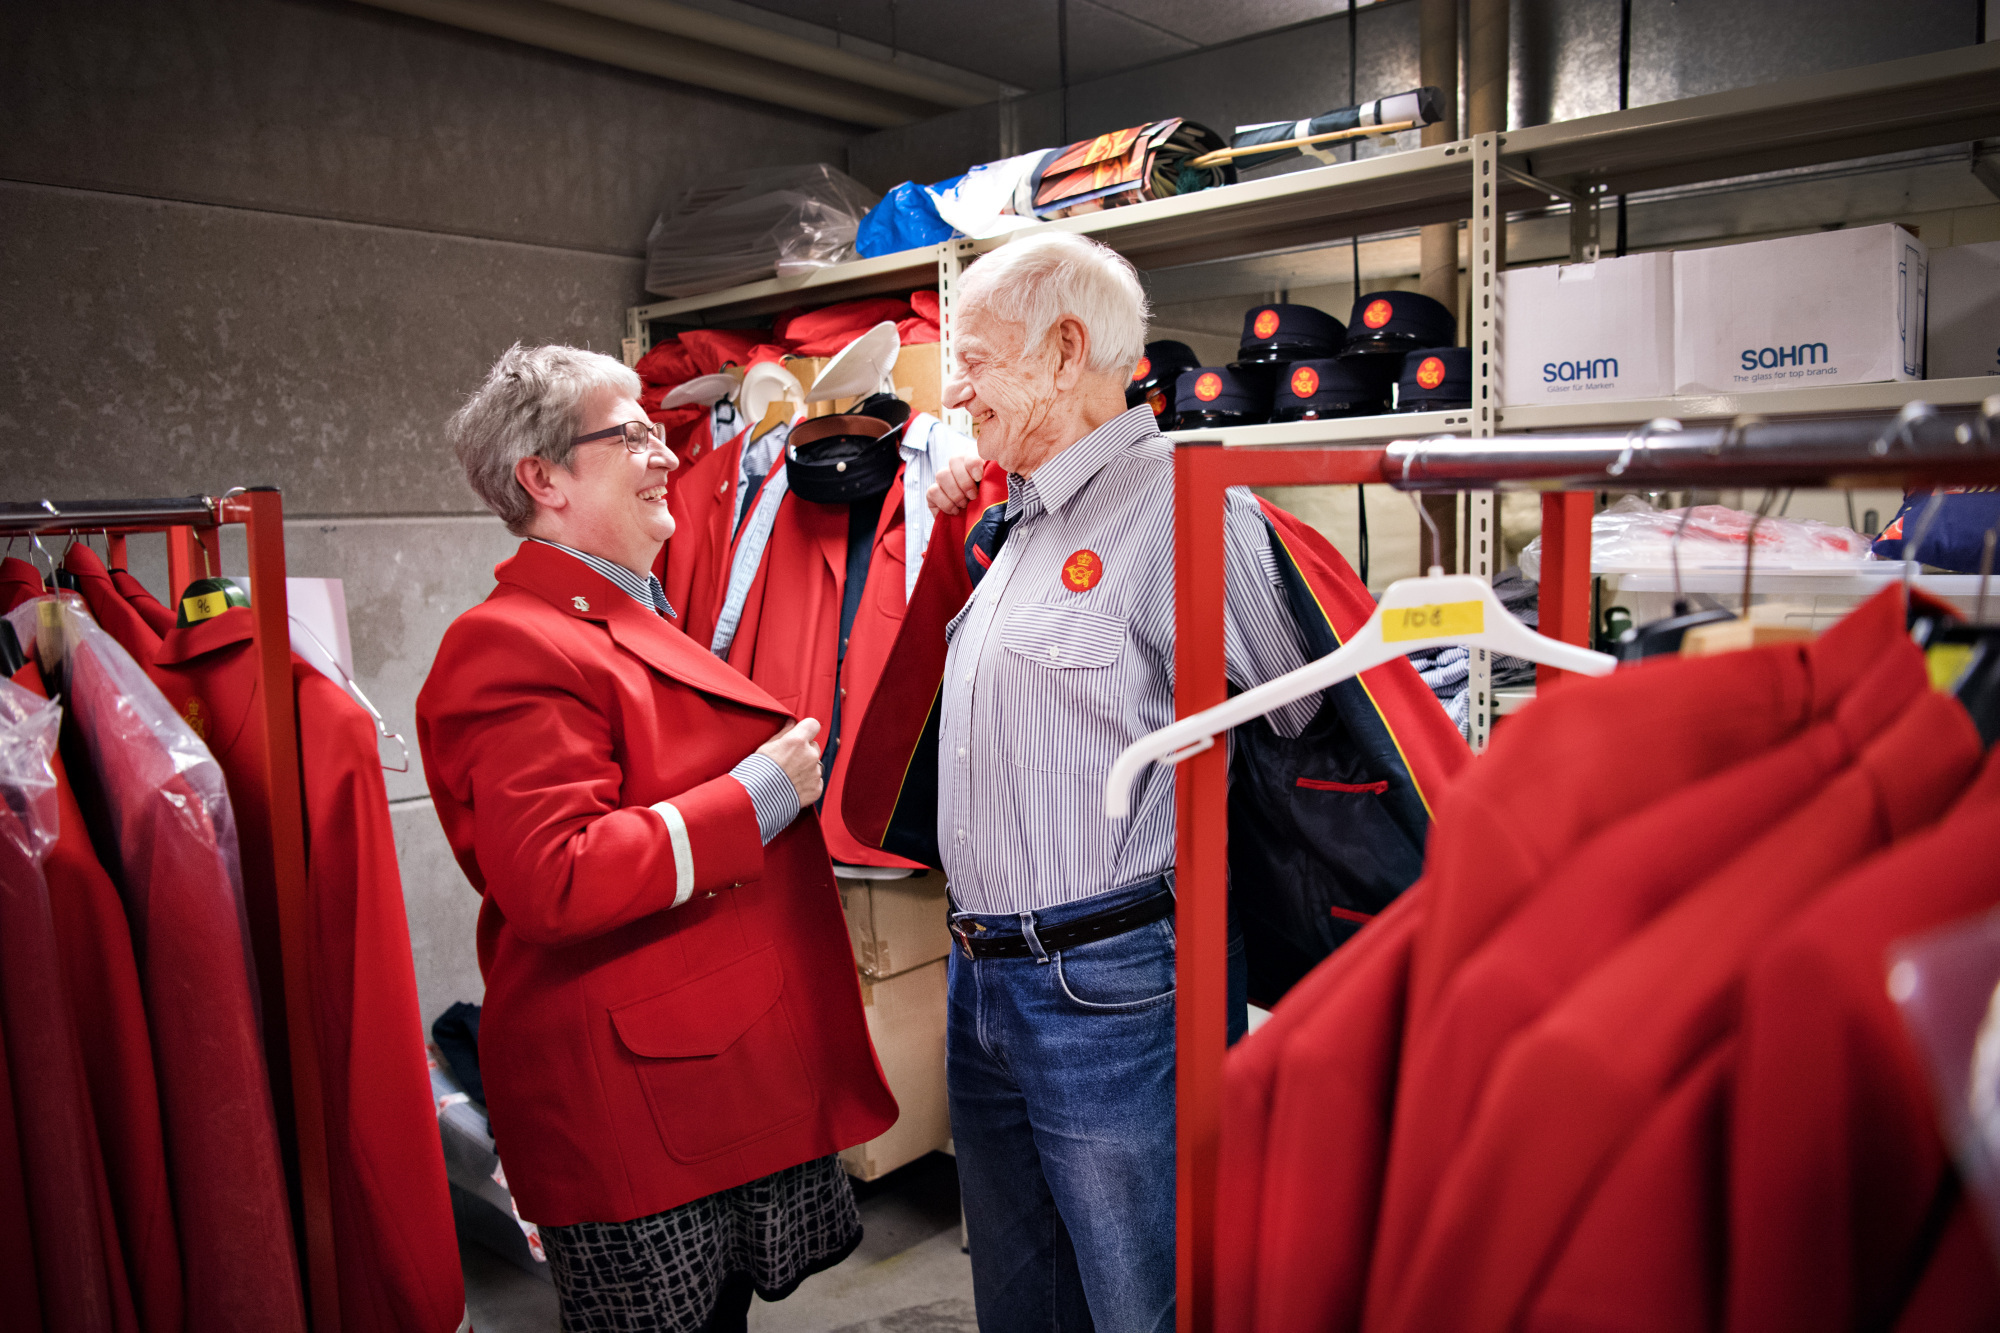 83-årige Gert har været med i postorkester siden 1955: - Vi beholder uniformen, så længe vi må